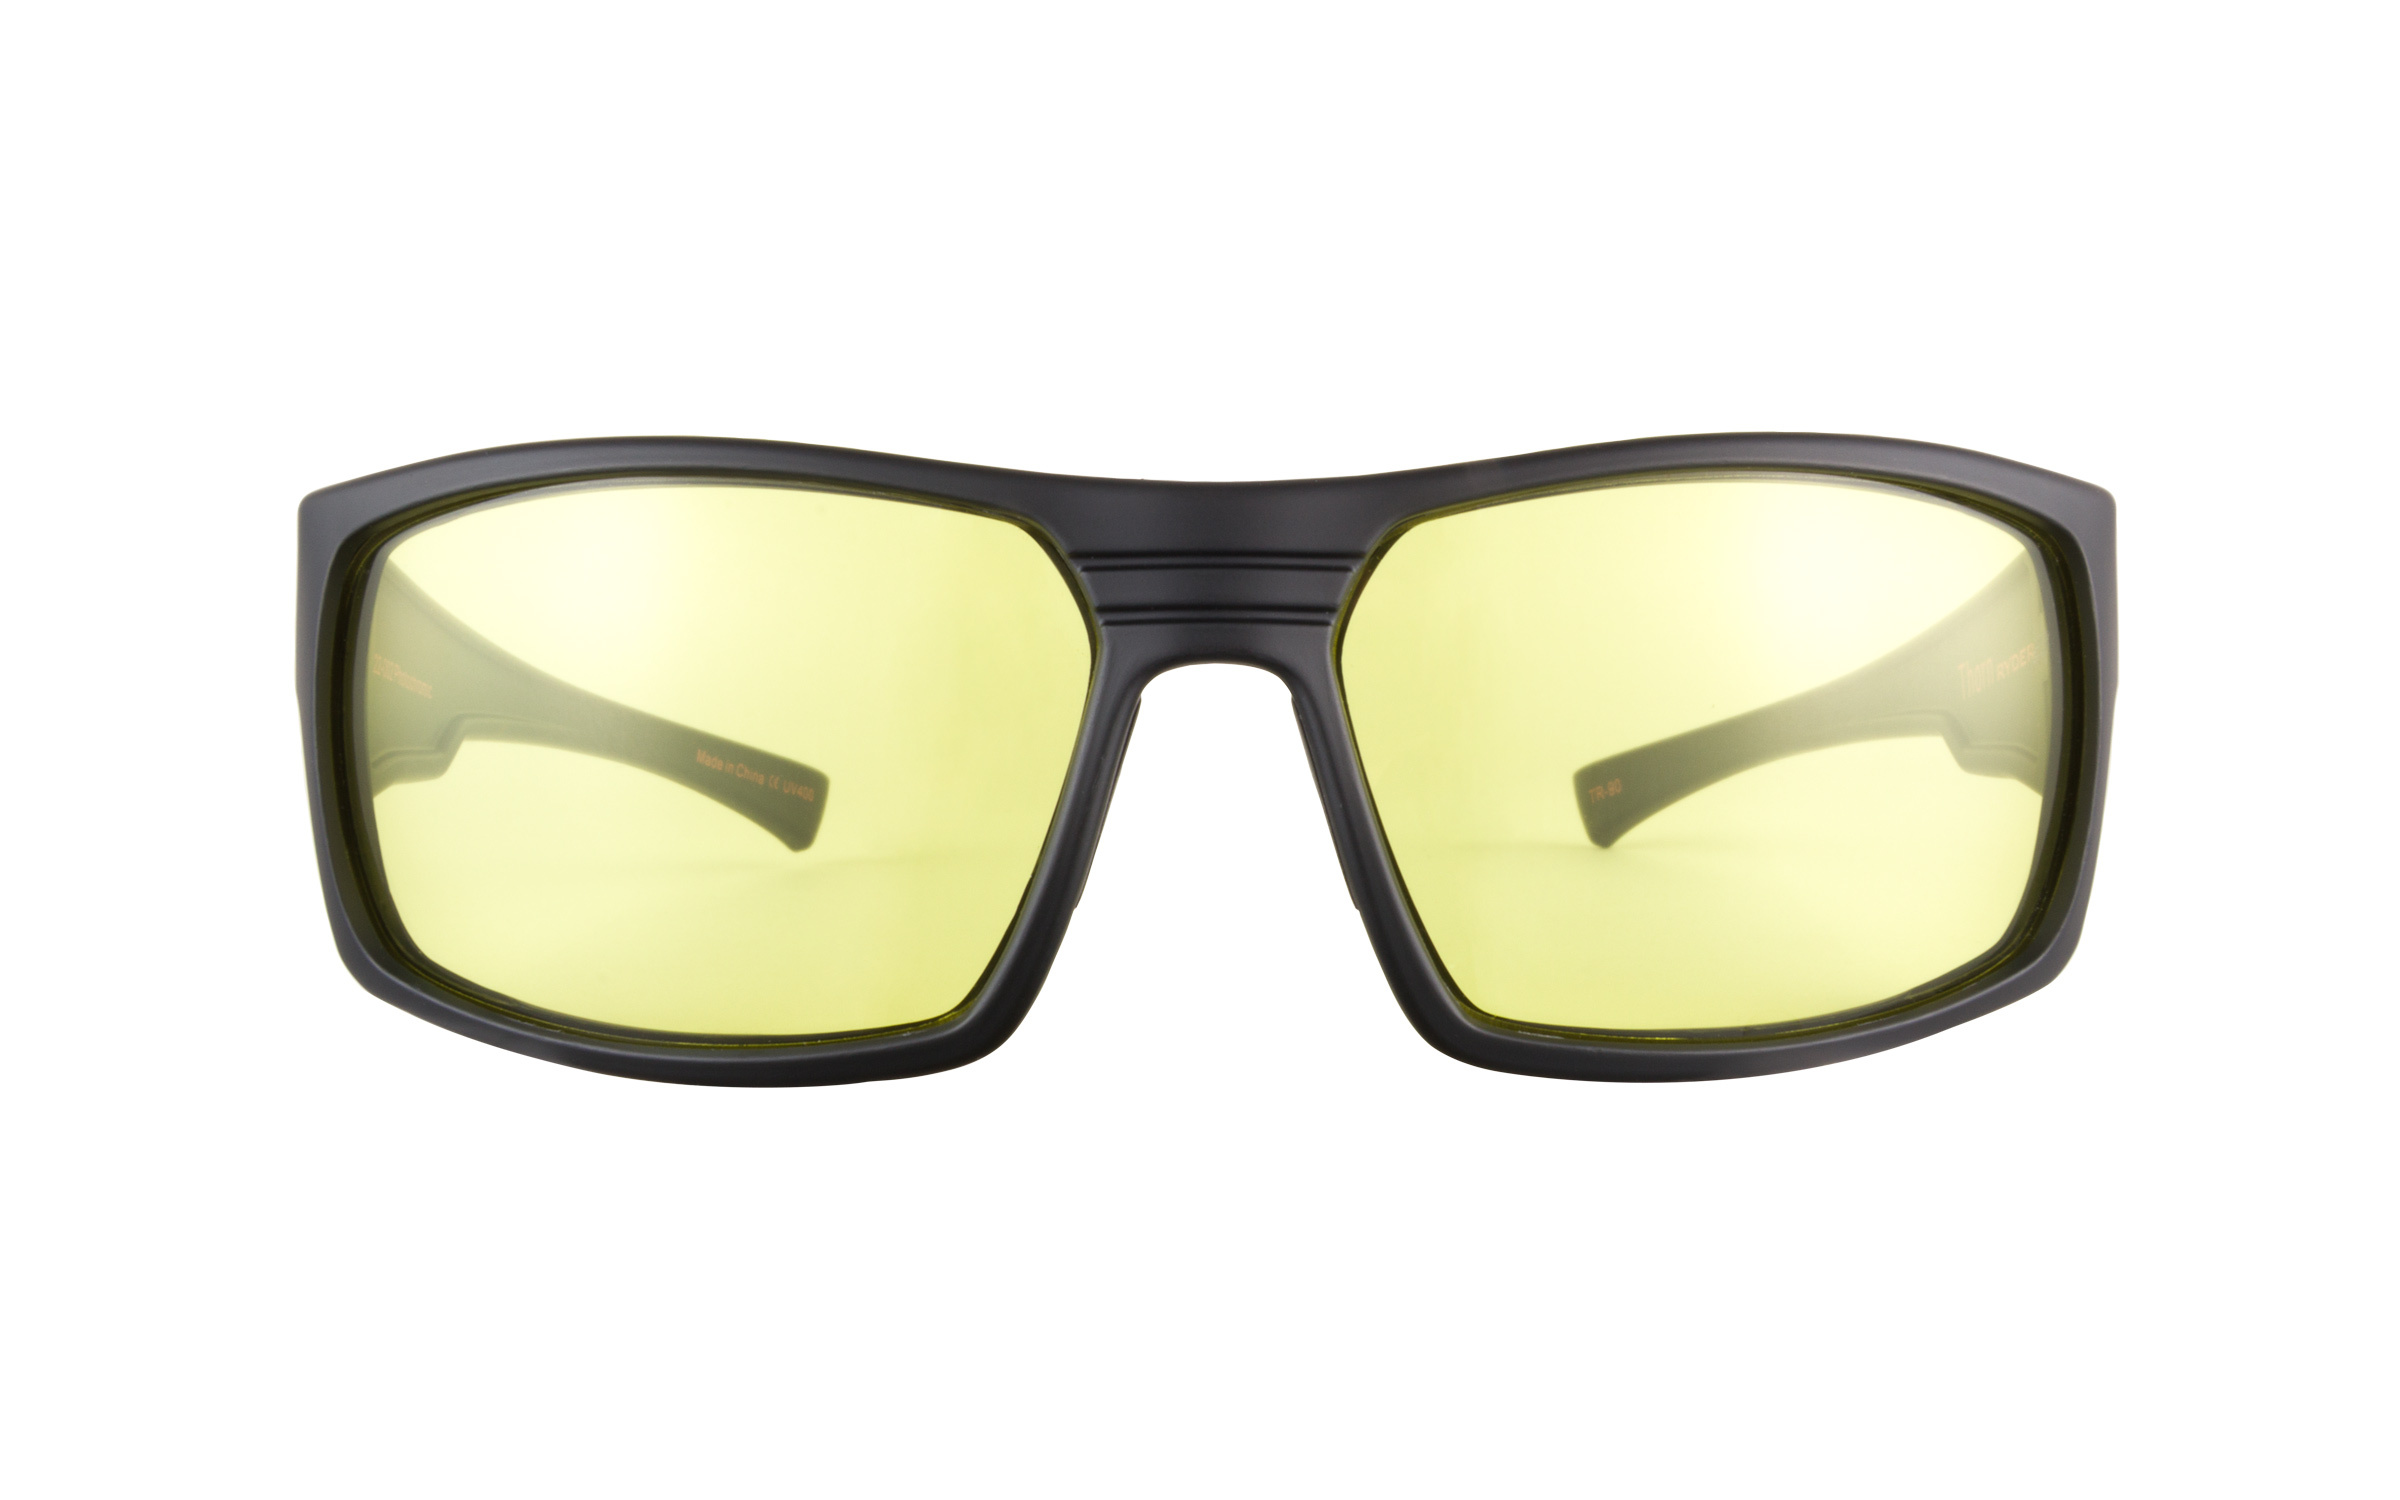 Ryders Thorn R922 002 Black Anti-Fog Photochromic Sunglasses